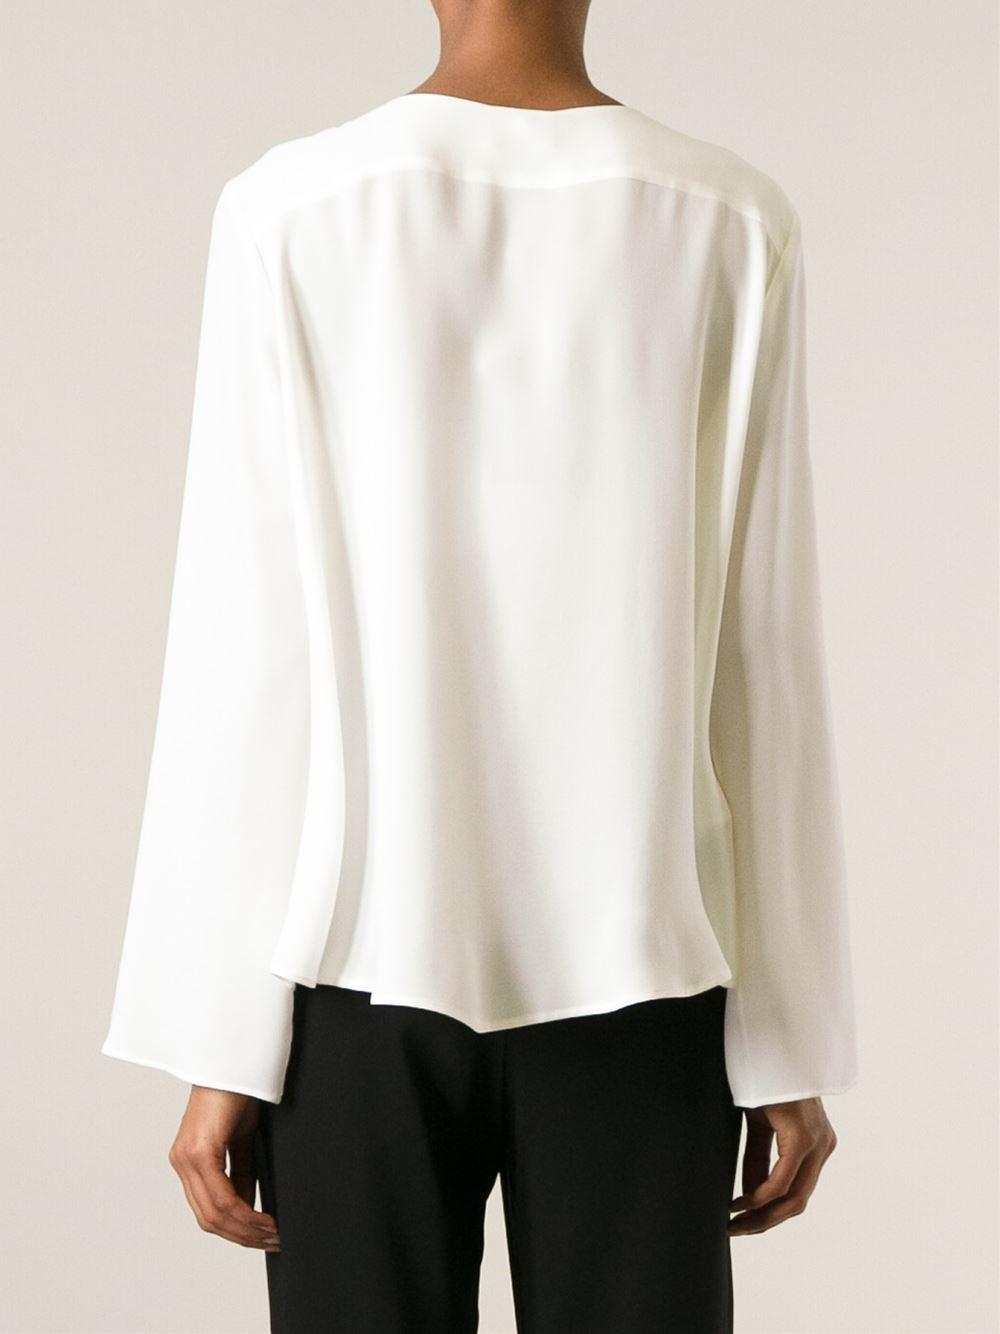 Lyst Giorgio Armani Loose Fit Blouse In White